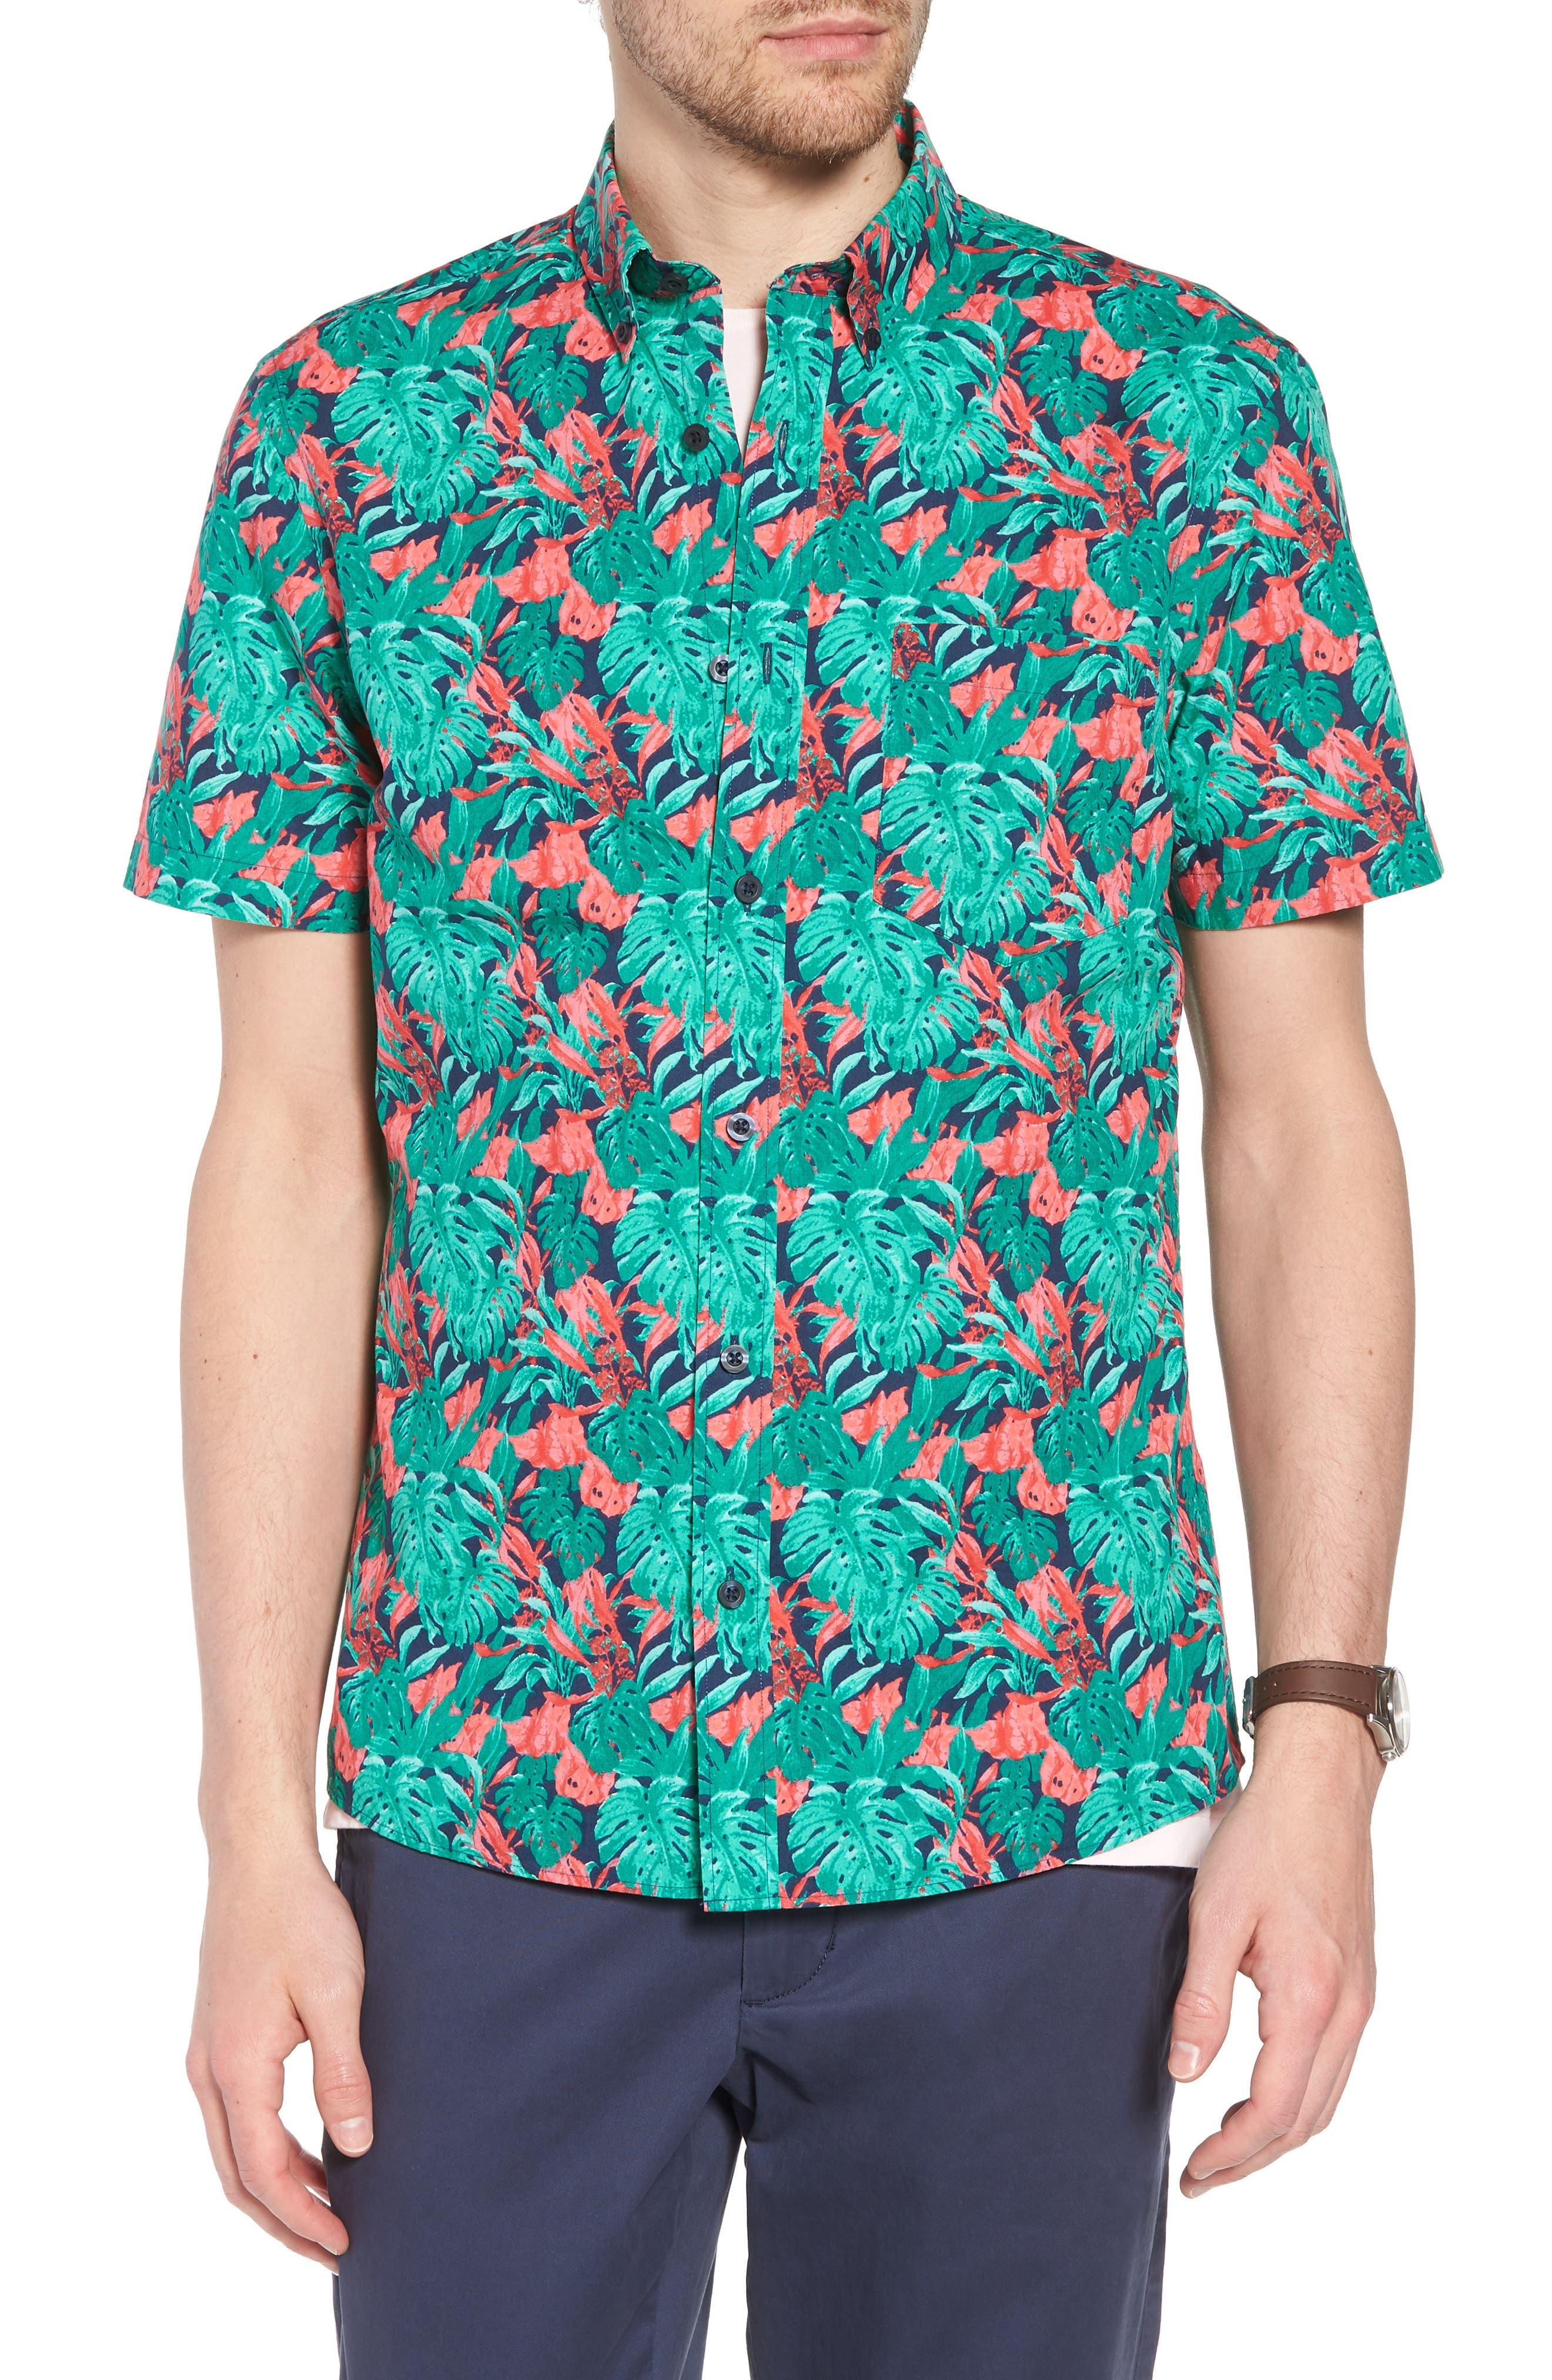 Trim Fit Print Short Sleeve Sport Shirt,                             Main thumbnail 1, color,                             Green Red Split Leaves